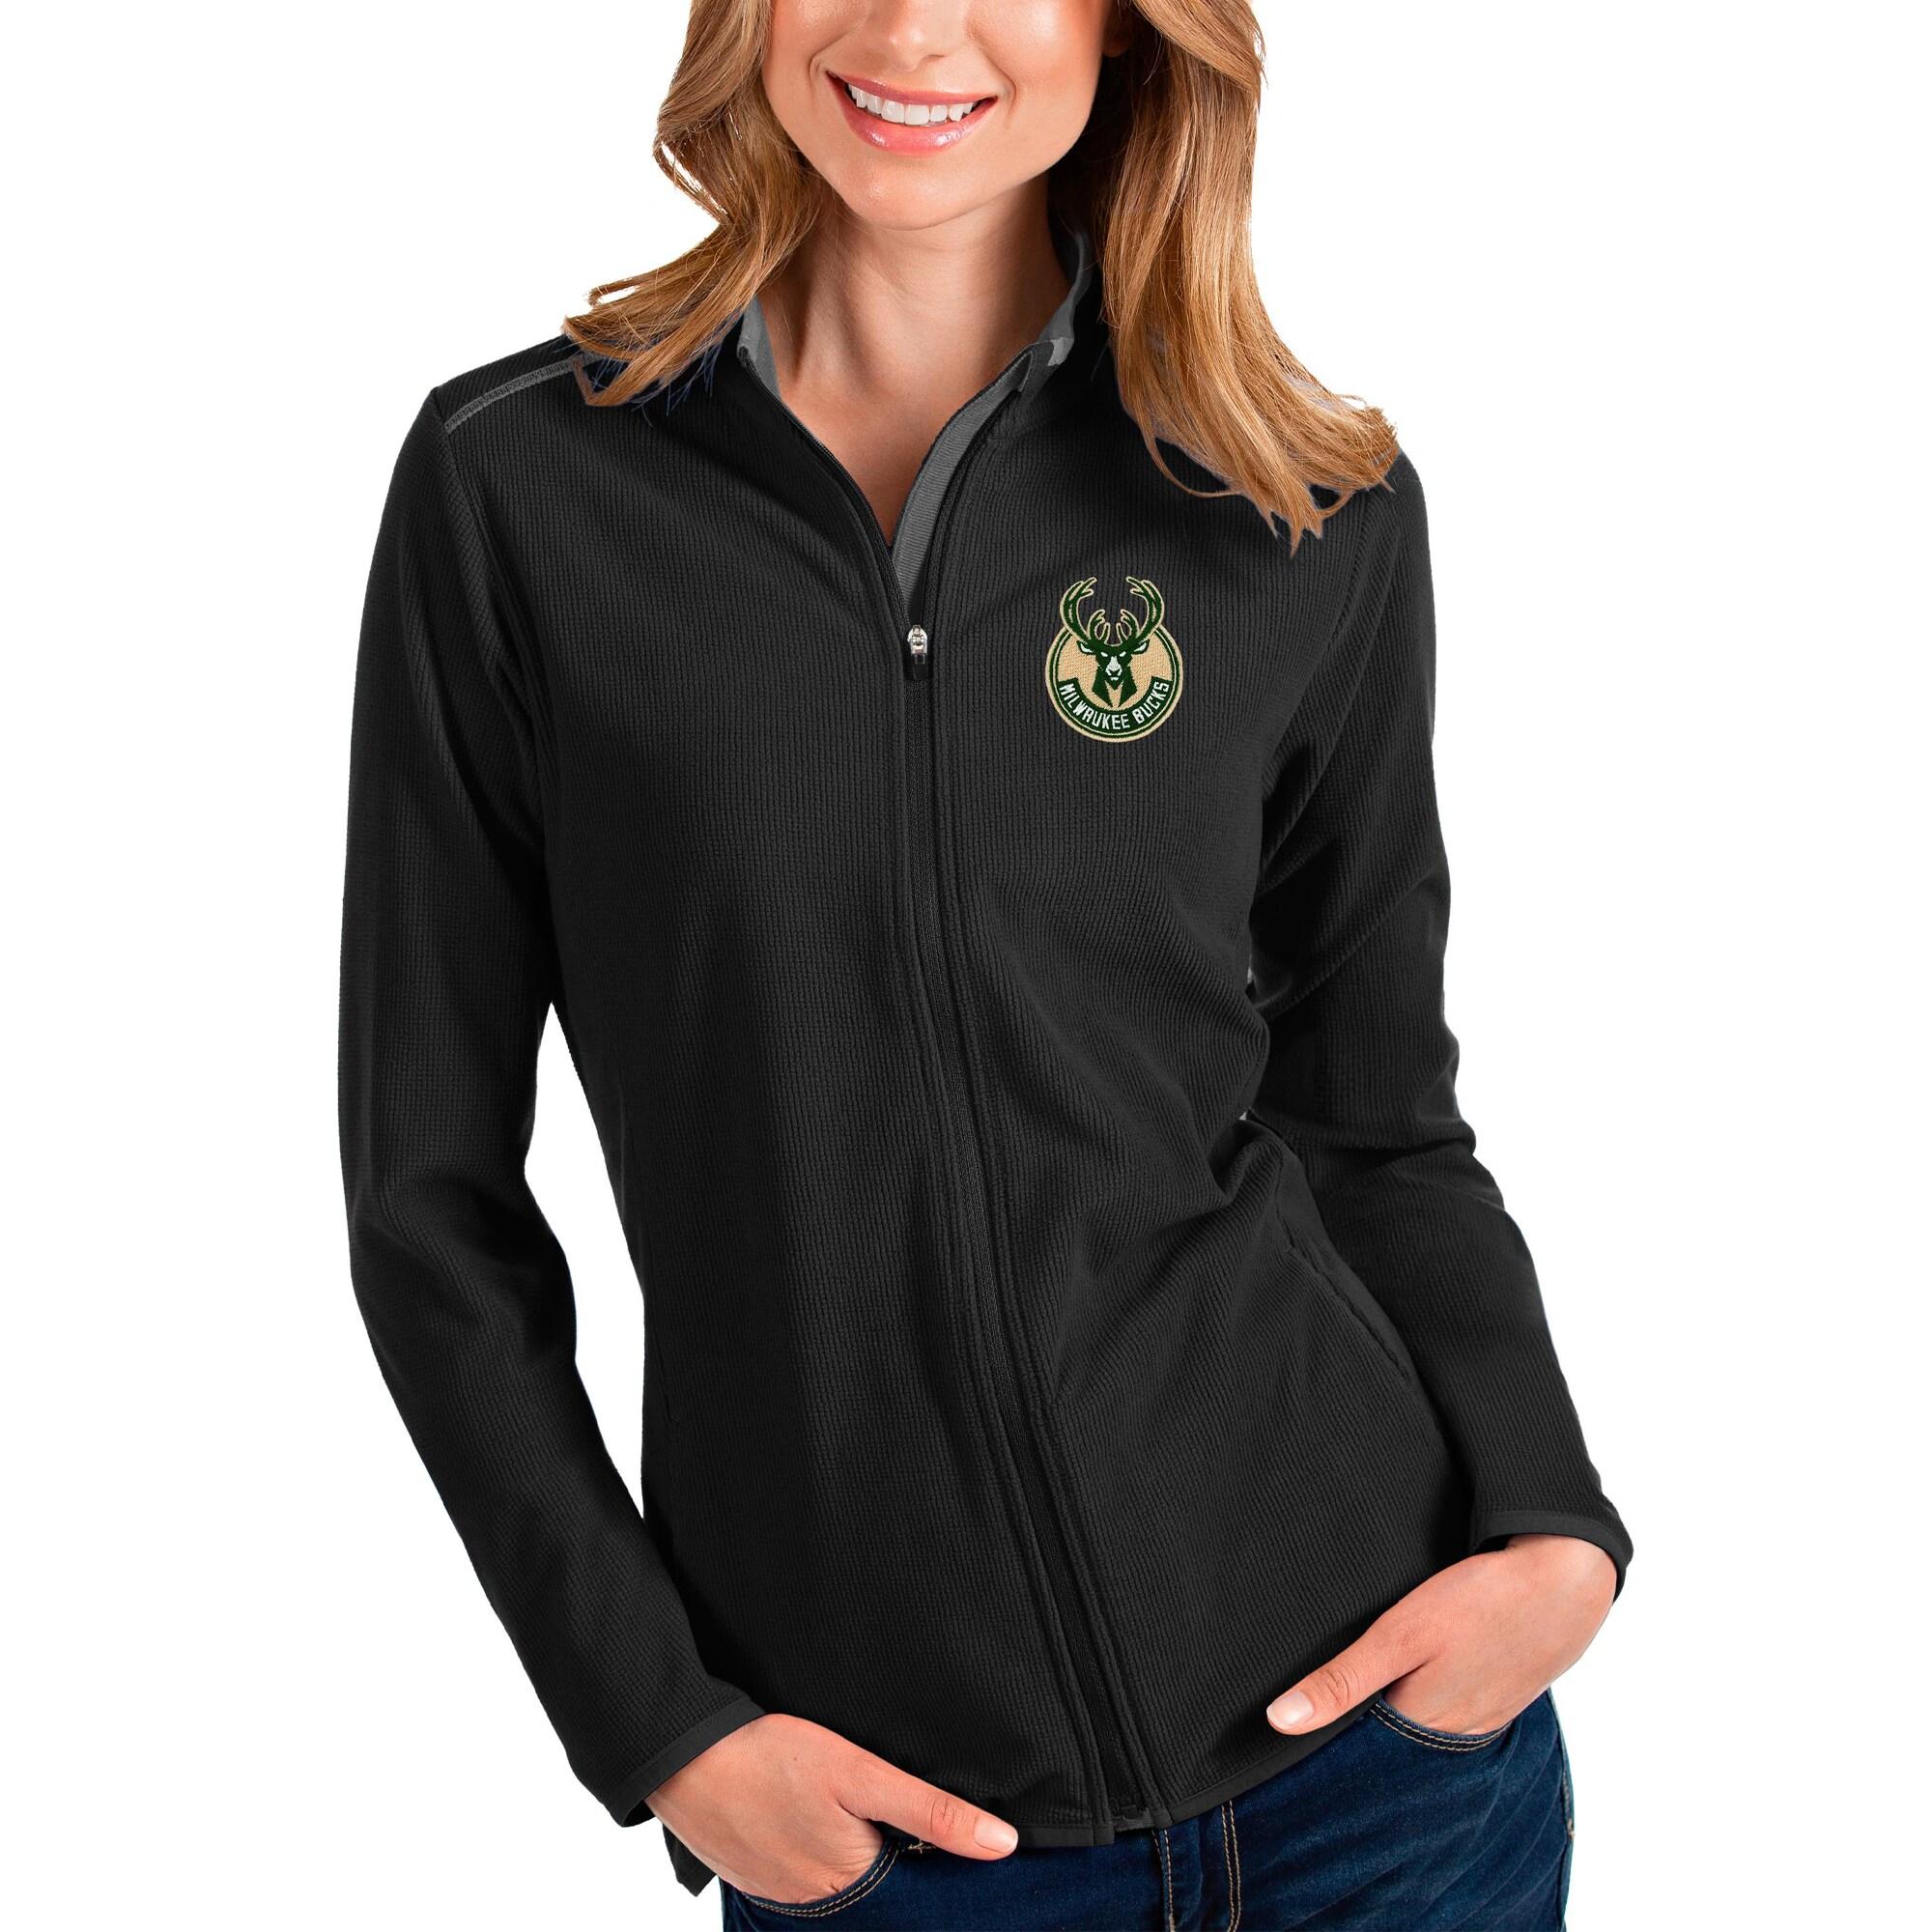 Milwaukee Bucks Antigua Women's Glacier Full-Zip Jacket - Black/Gray